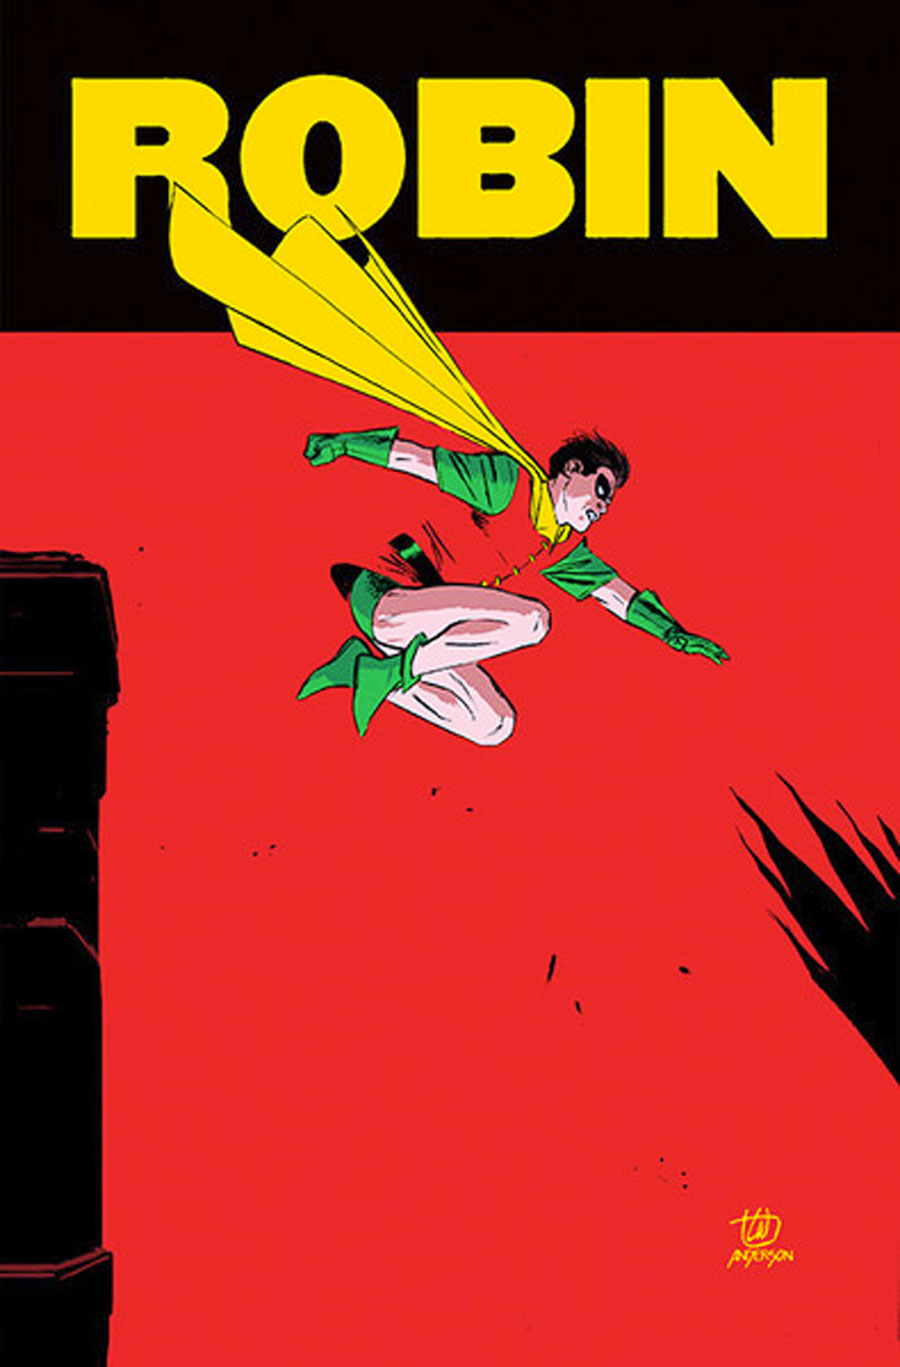 Robin-80th-anniversary